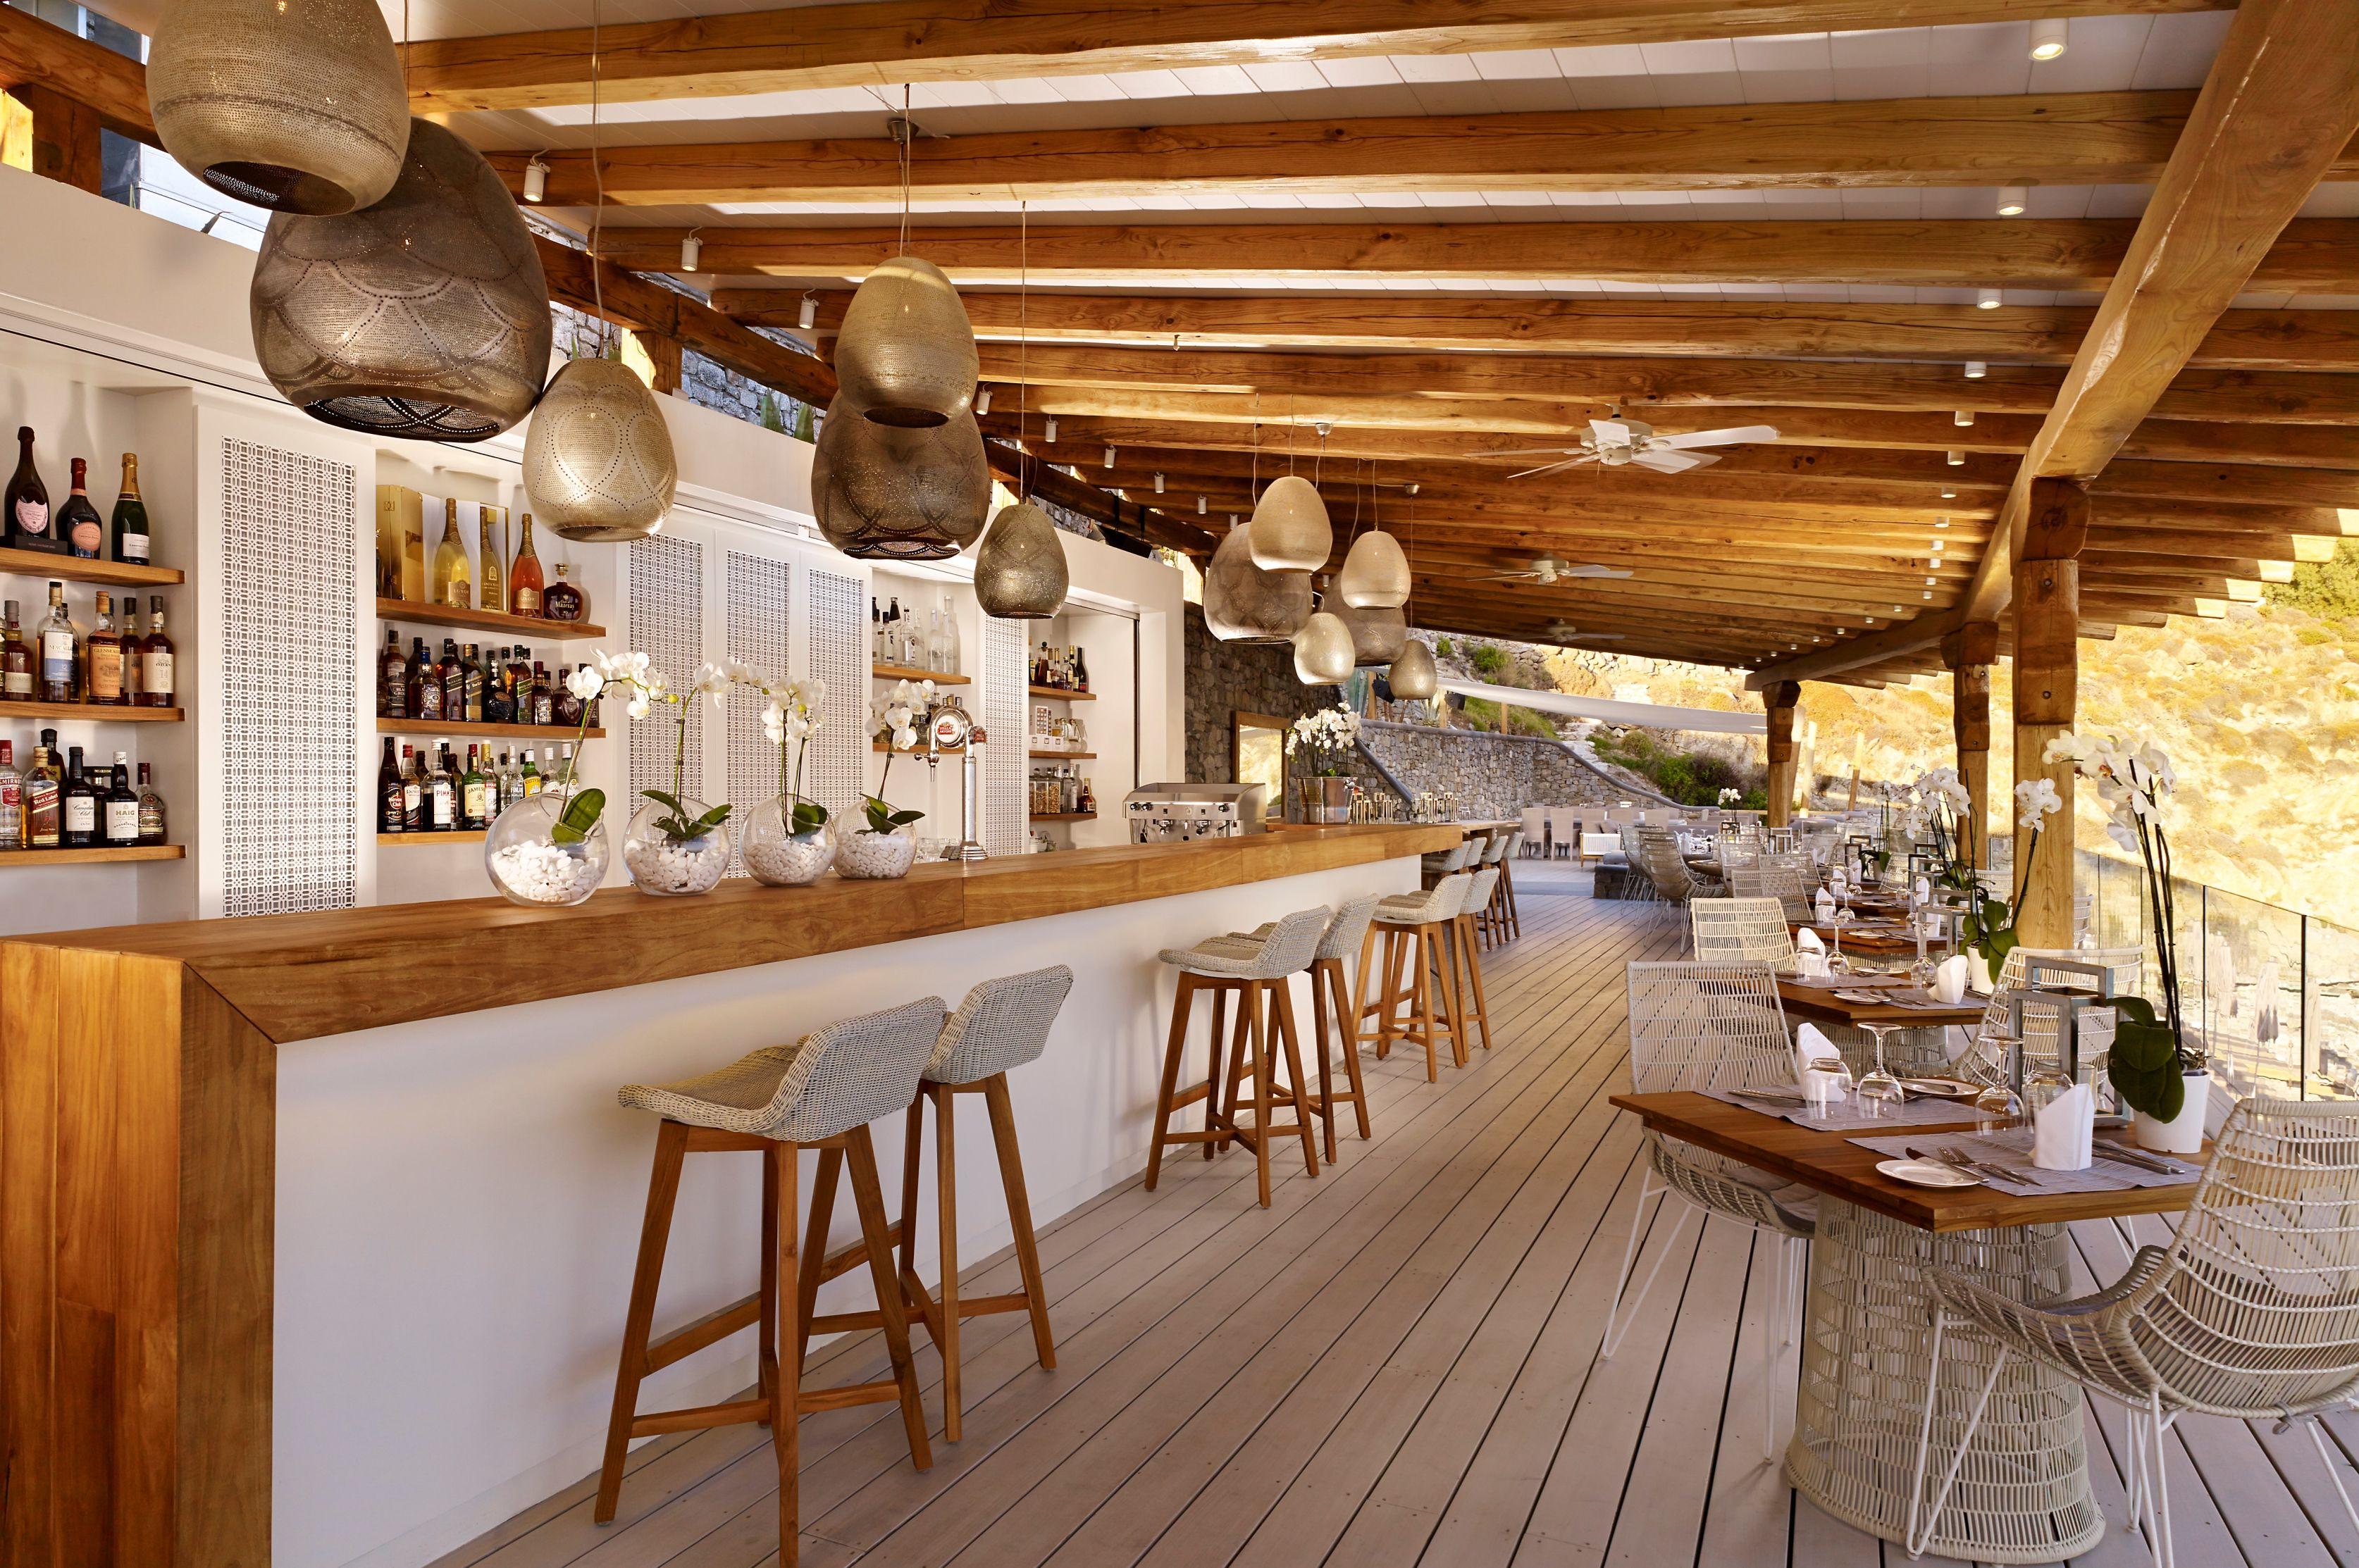 Beaches Bar Designs for Restaurants